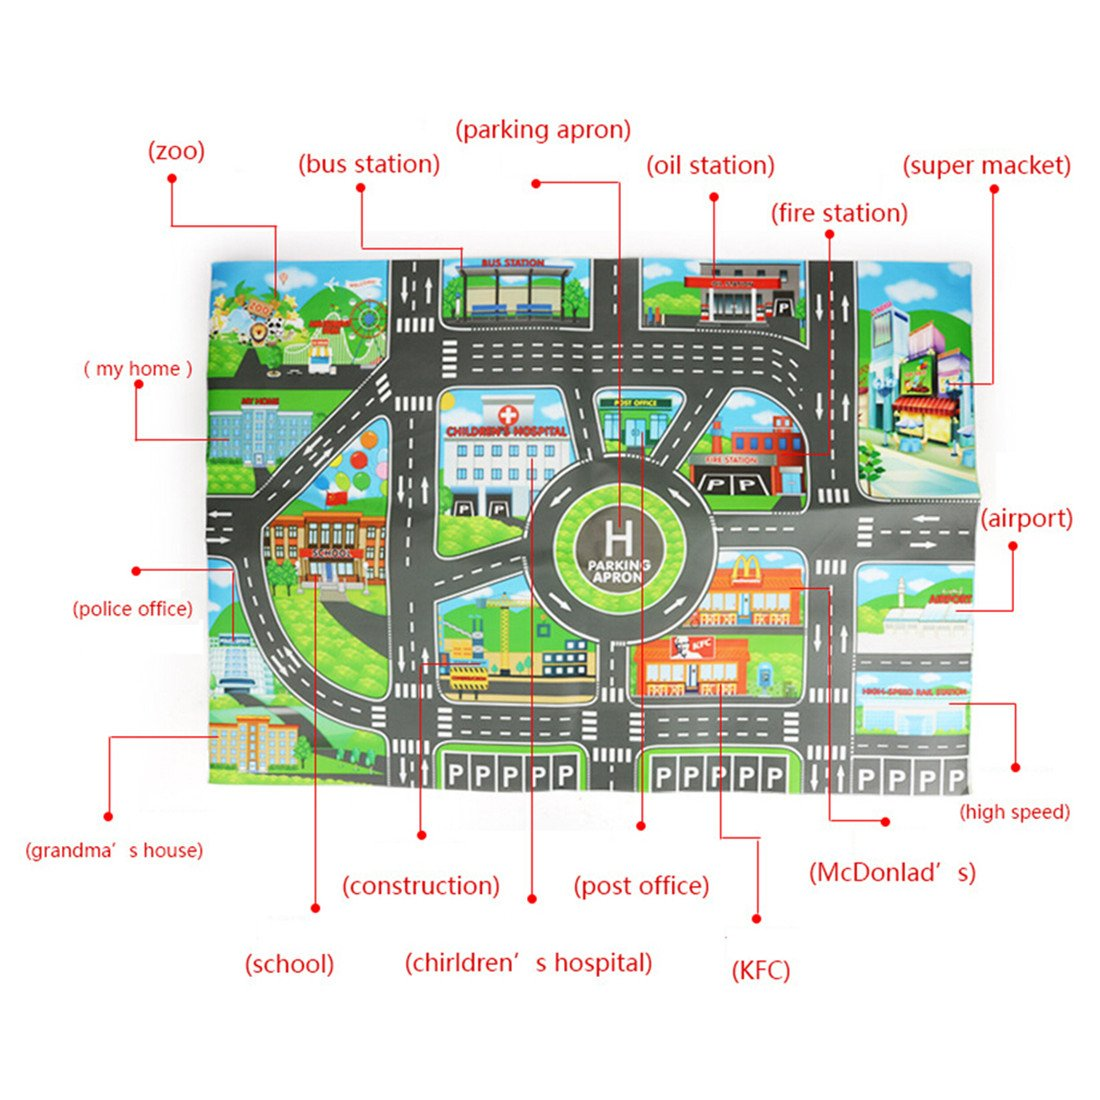 Amazon.com: Edtoy Children Play Car Carpet City Map Kids Toys: Toys & Games